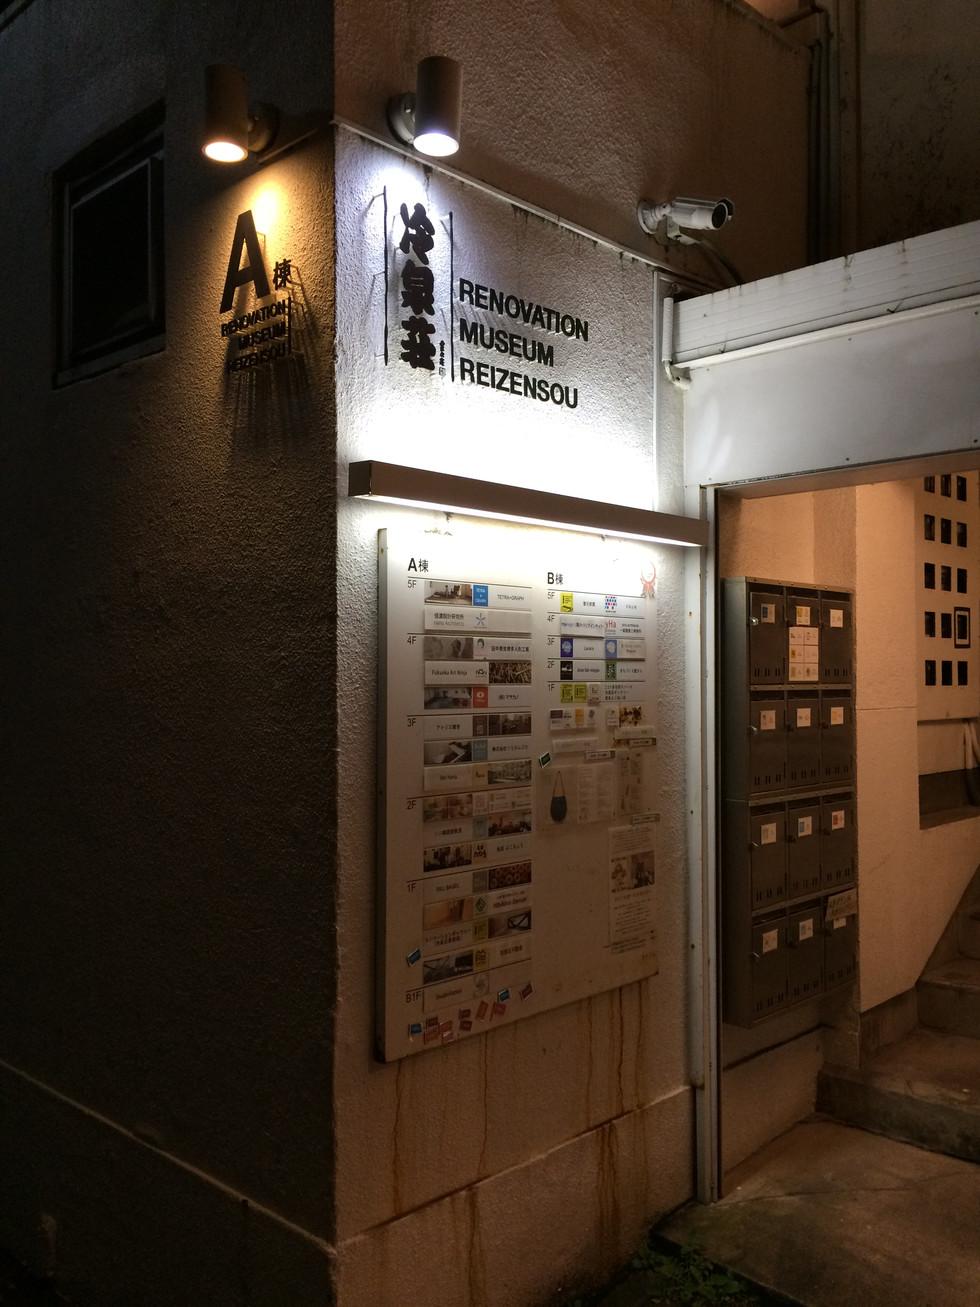 Renovation Museum Reizensou